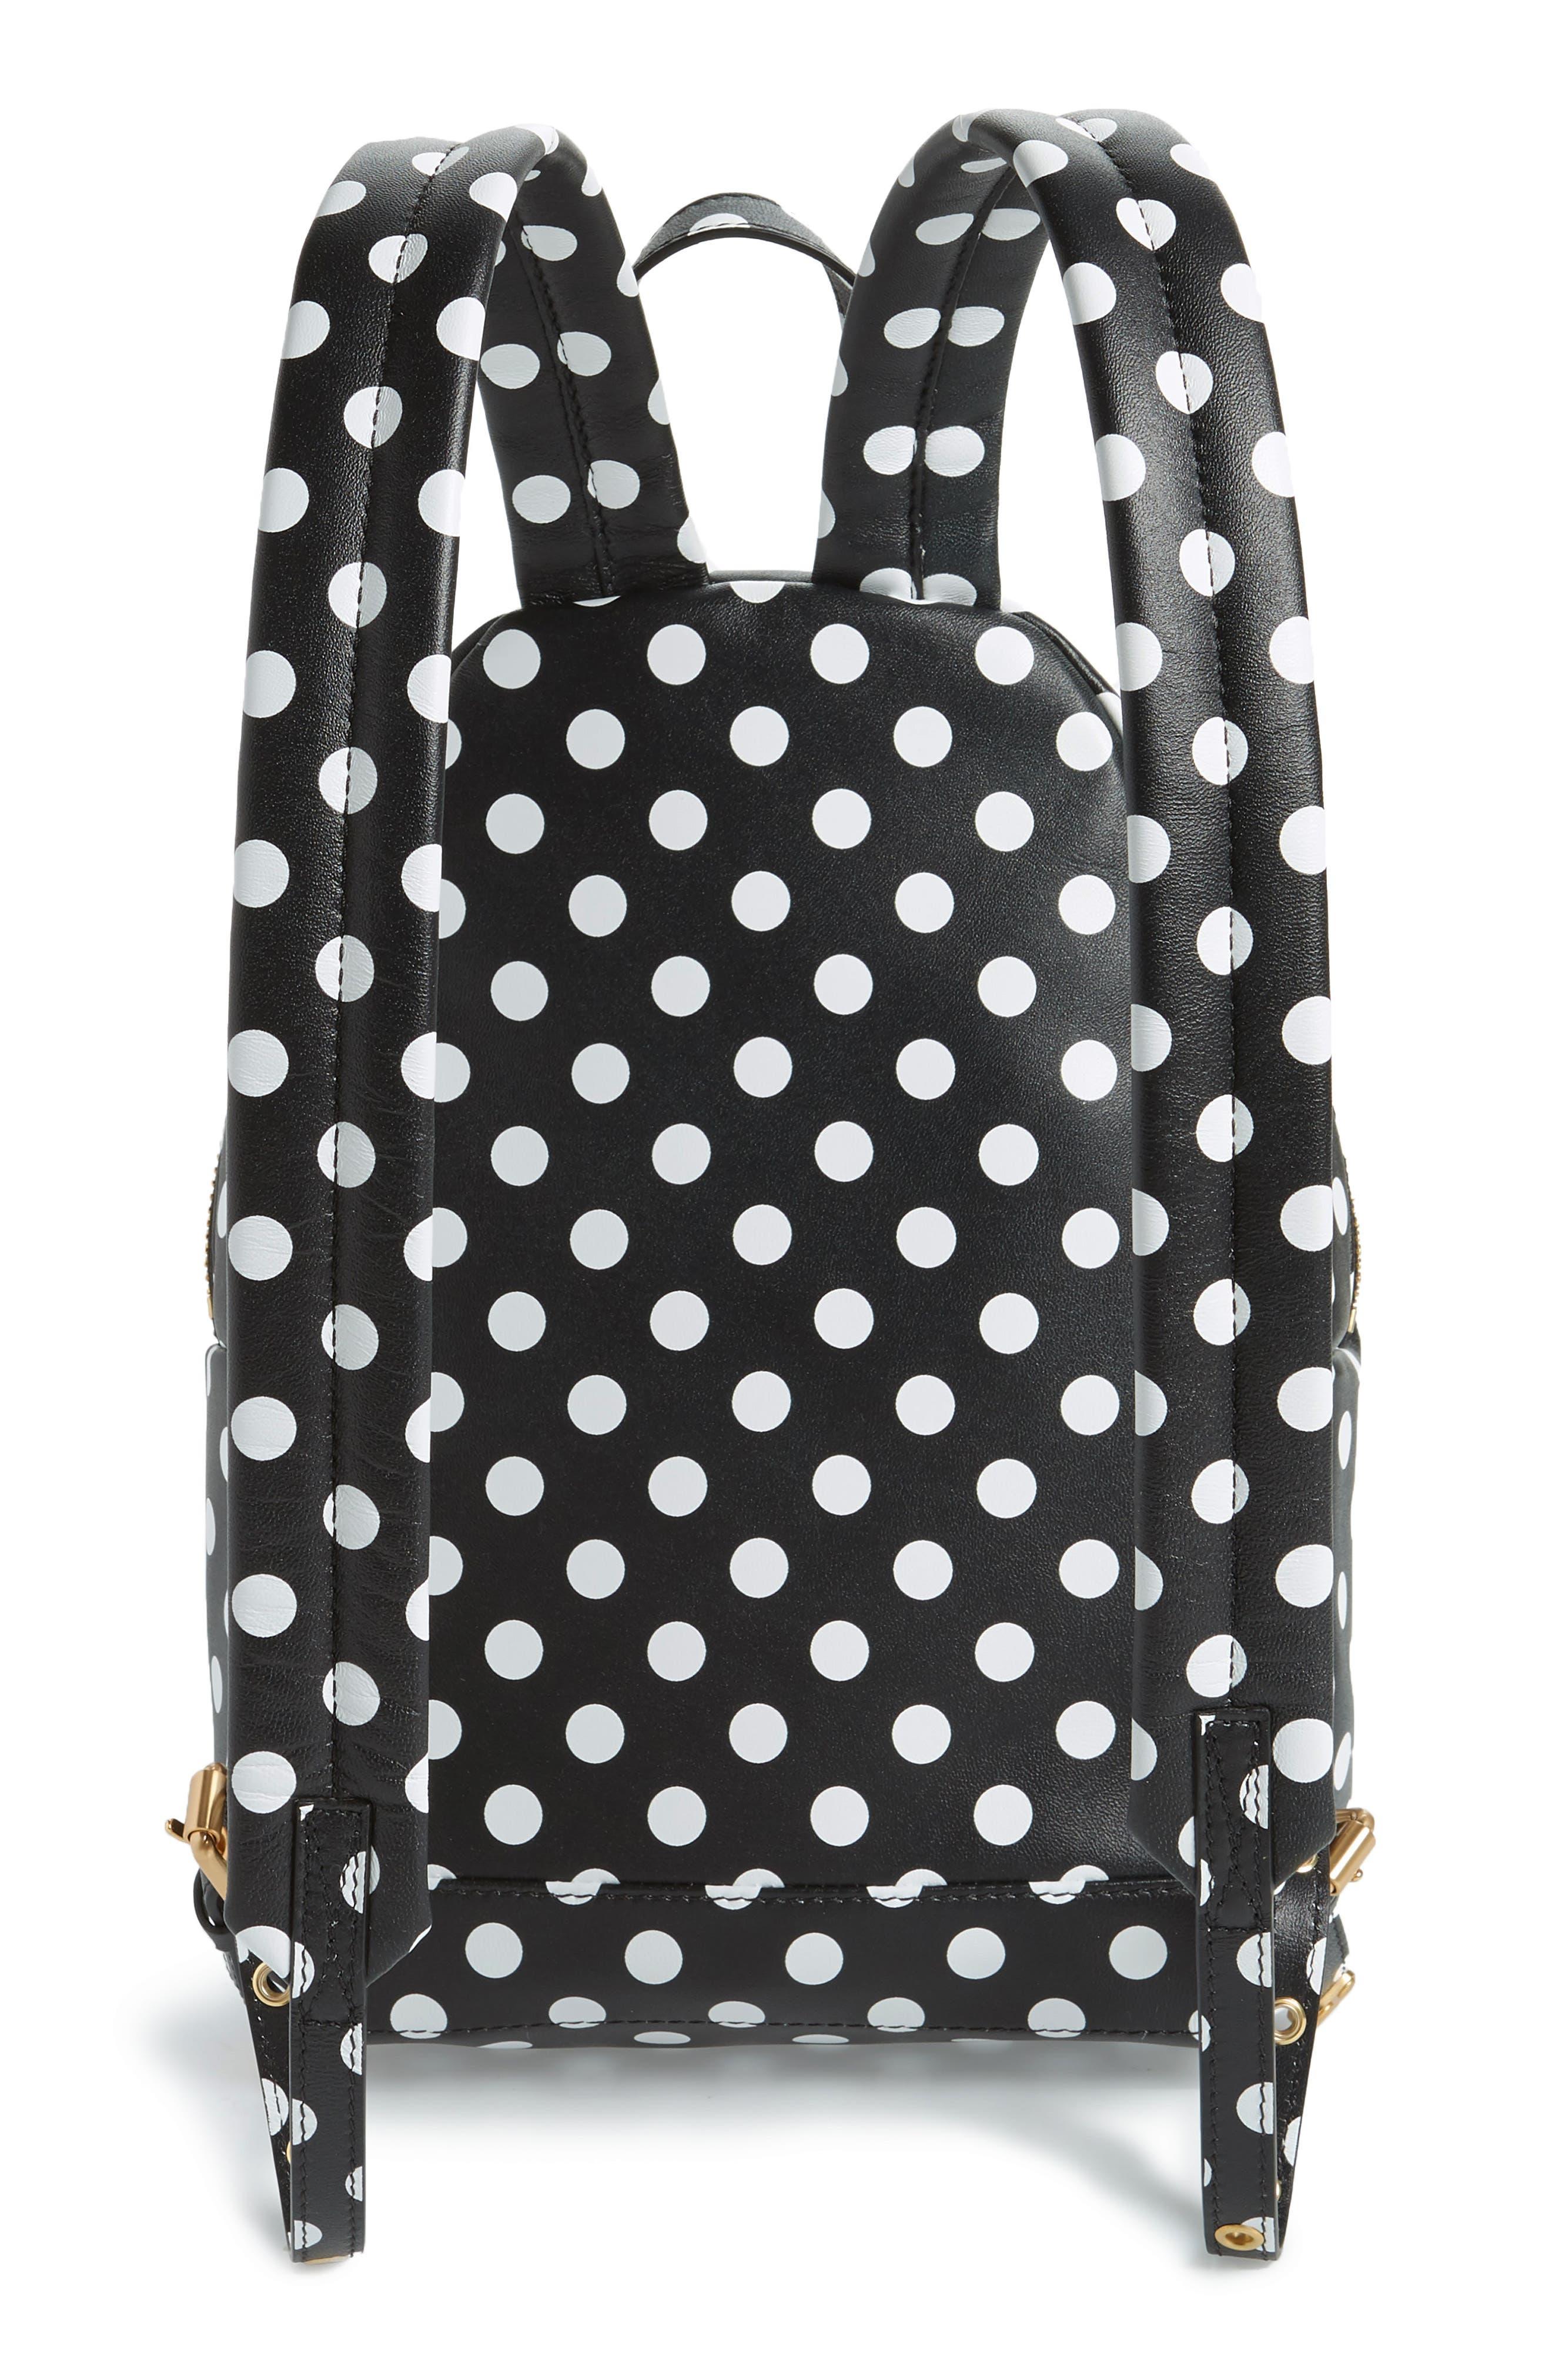 MOSCHINO, Logo Polka Dot Backpack, Alternate thumbnail 3, color, BLACK/ WHITE